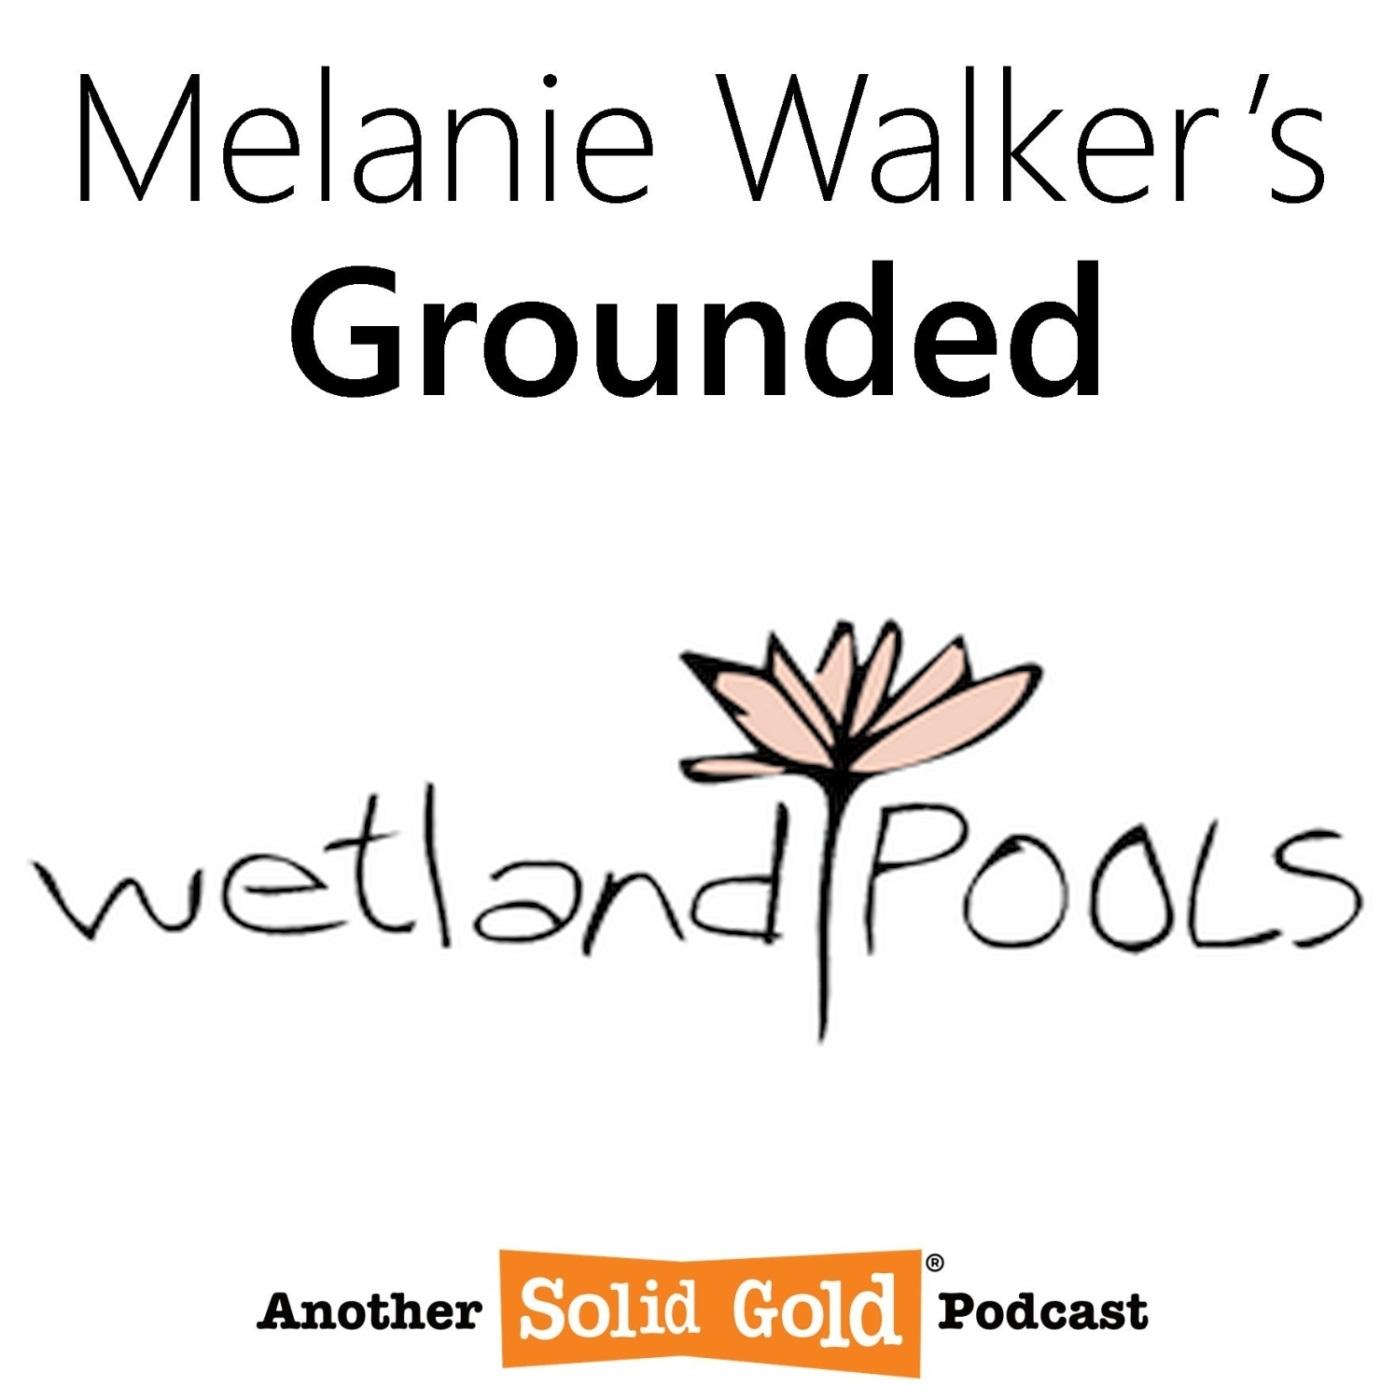 Water Wonderlands | Anthony Philbrick (Owner: Wetland Pools)